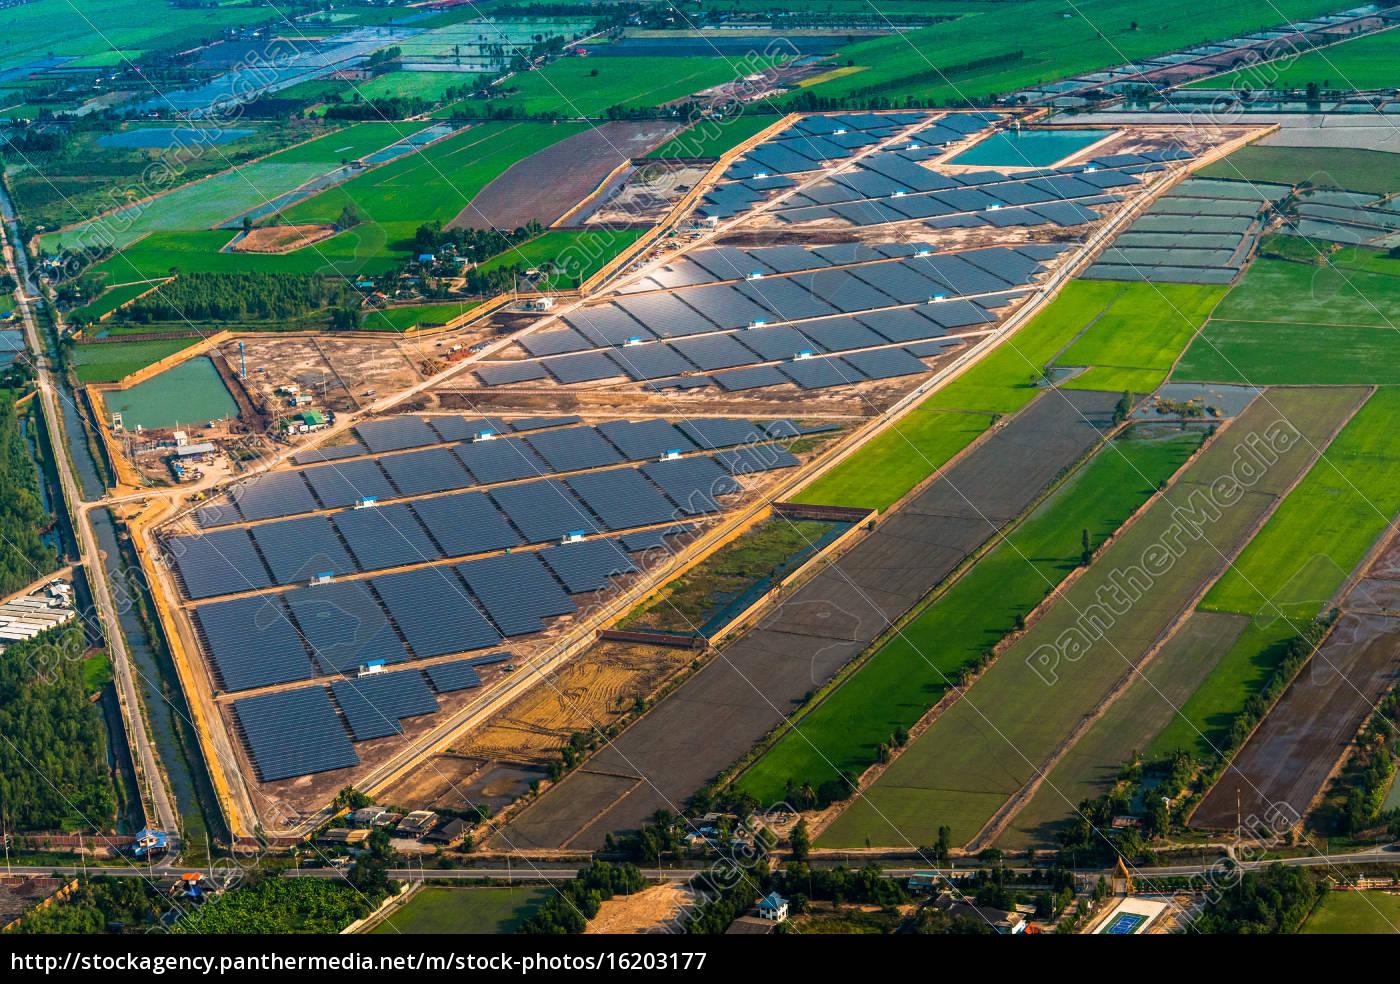 granja, solar, paneles, solares, foto, del, aire - 16203177